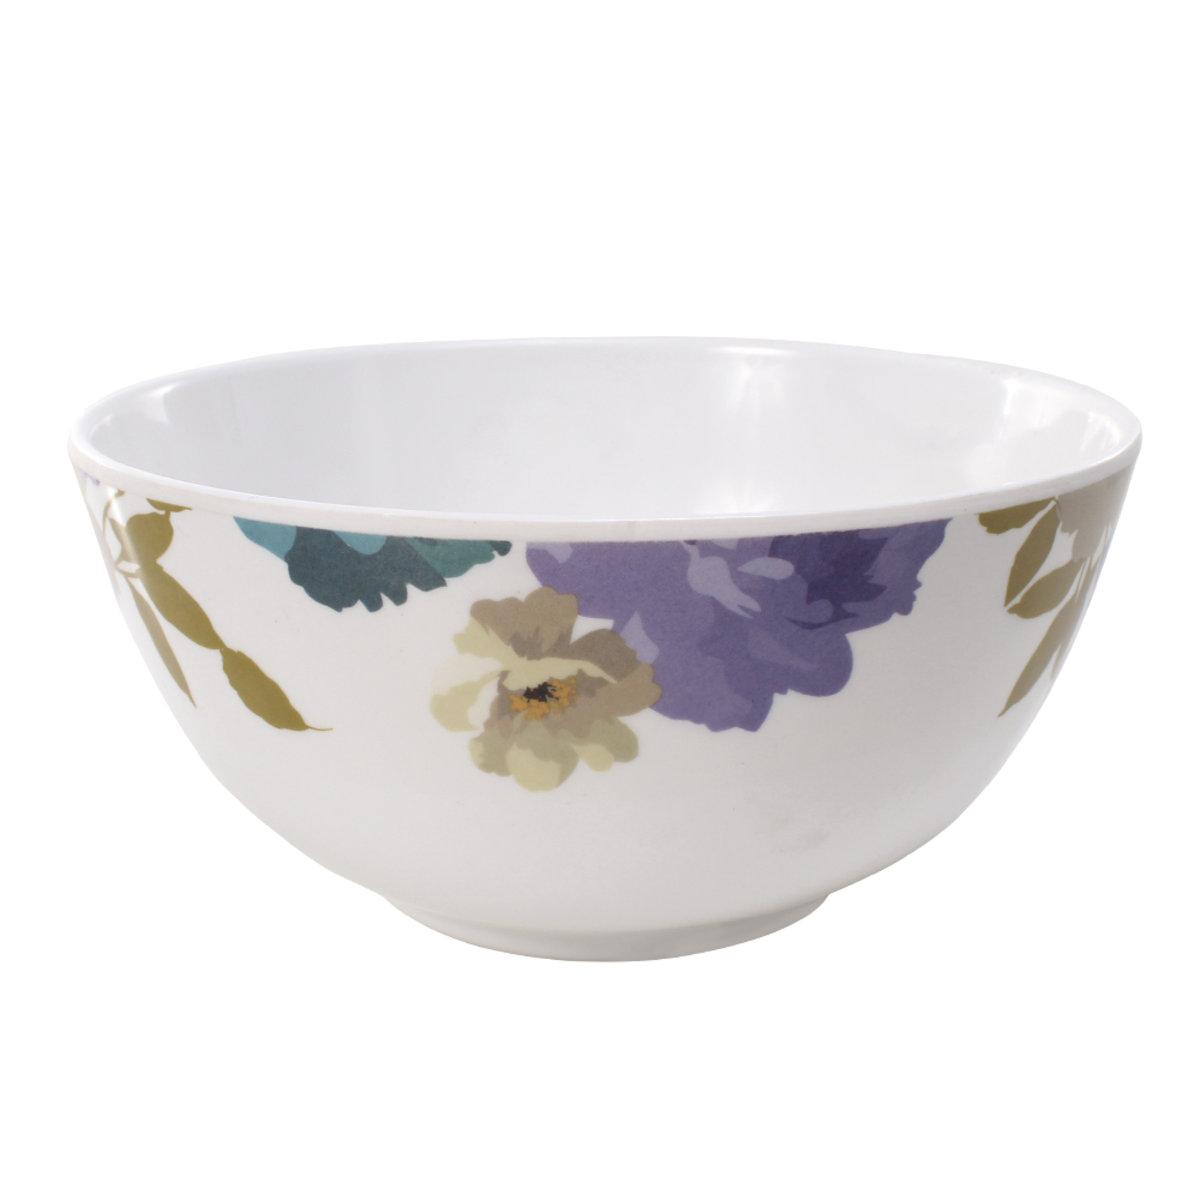 Bowl Tazon Decorativo Melamina 1 Pieza Crown Baccara